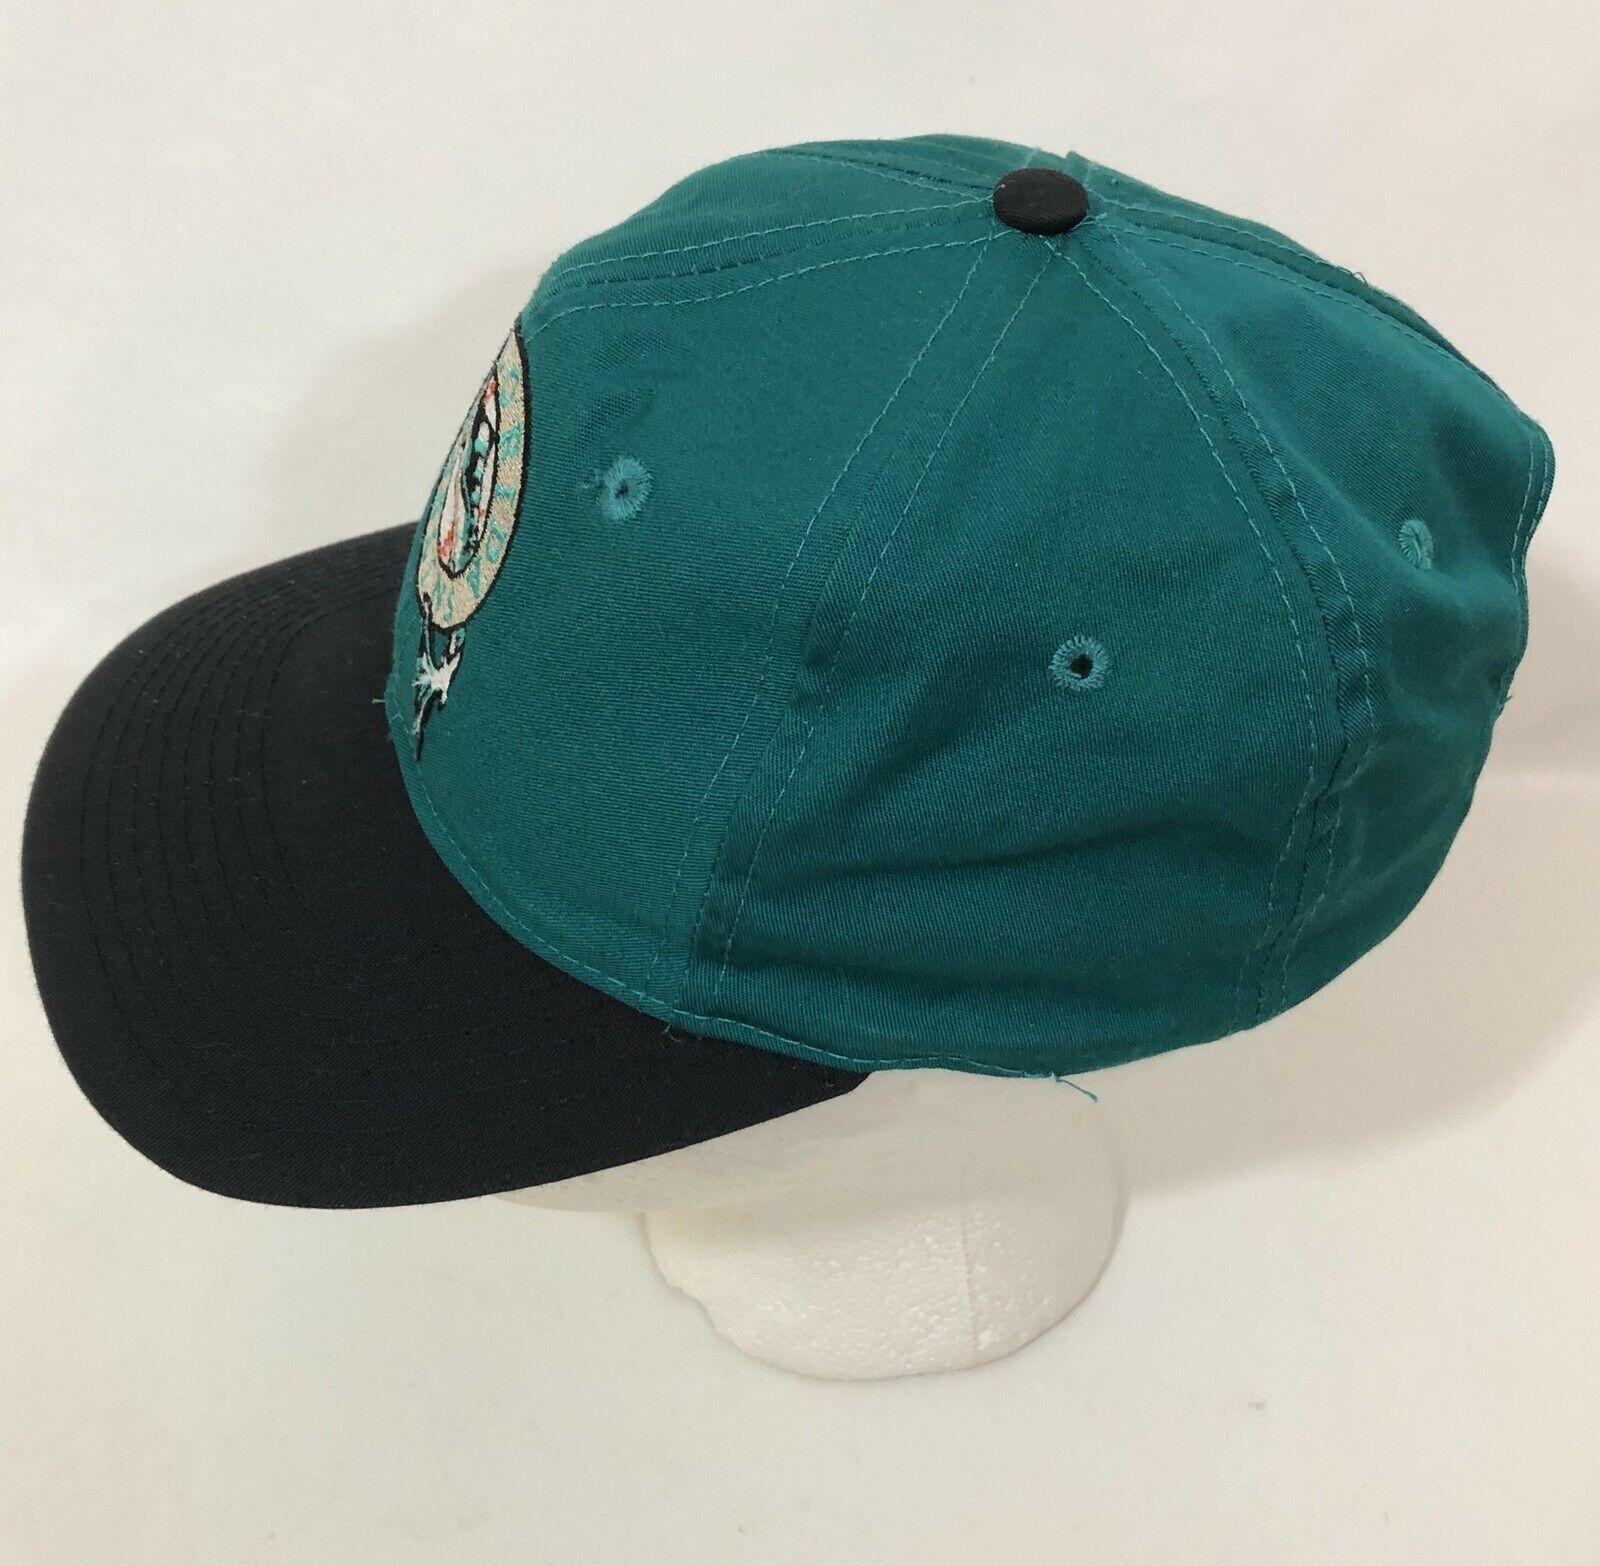 Vintage Florida Marlins MLB Baseball Snapback Hat